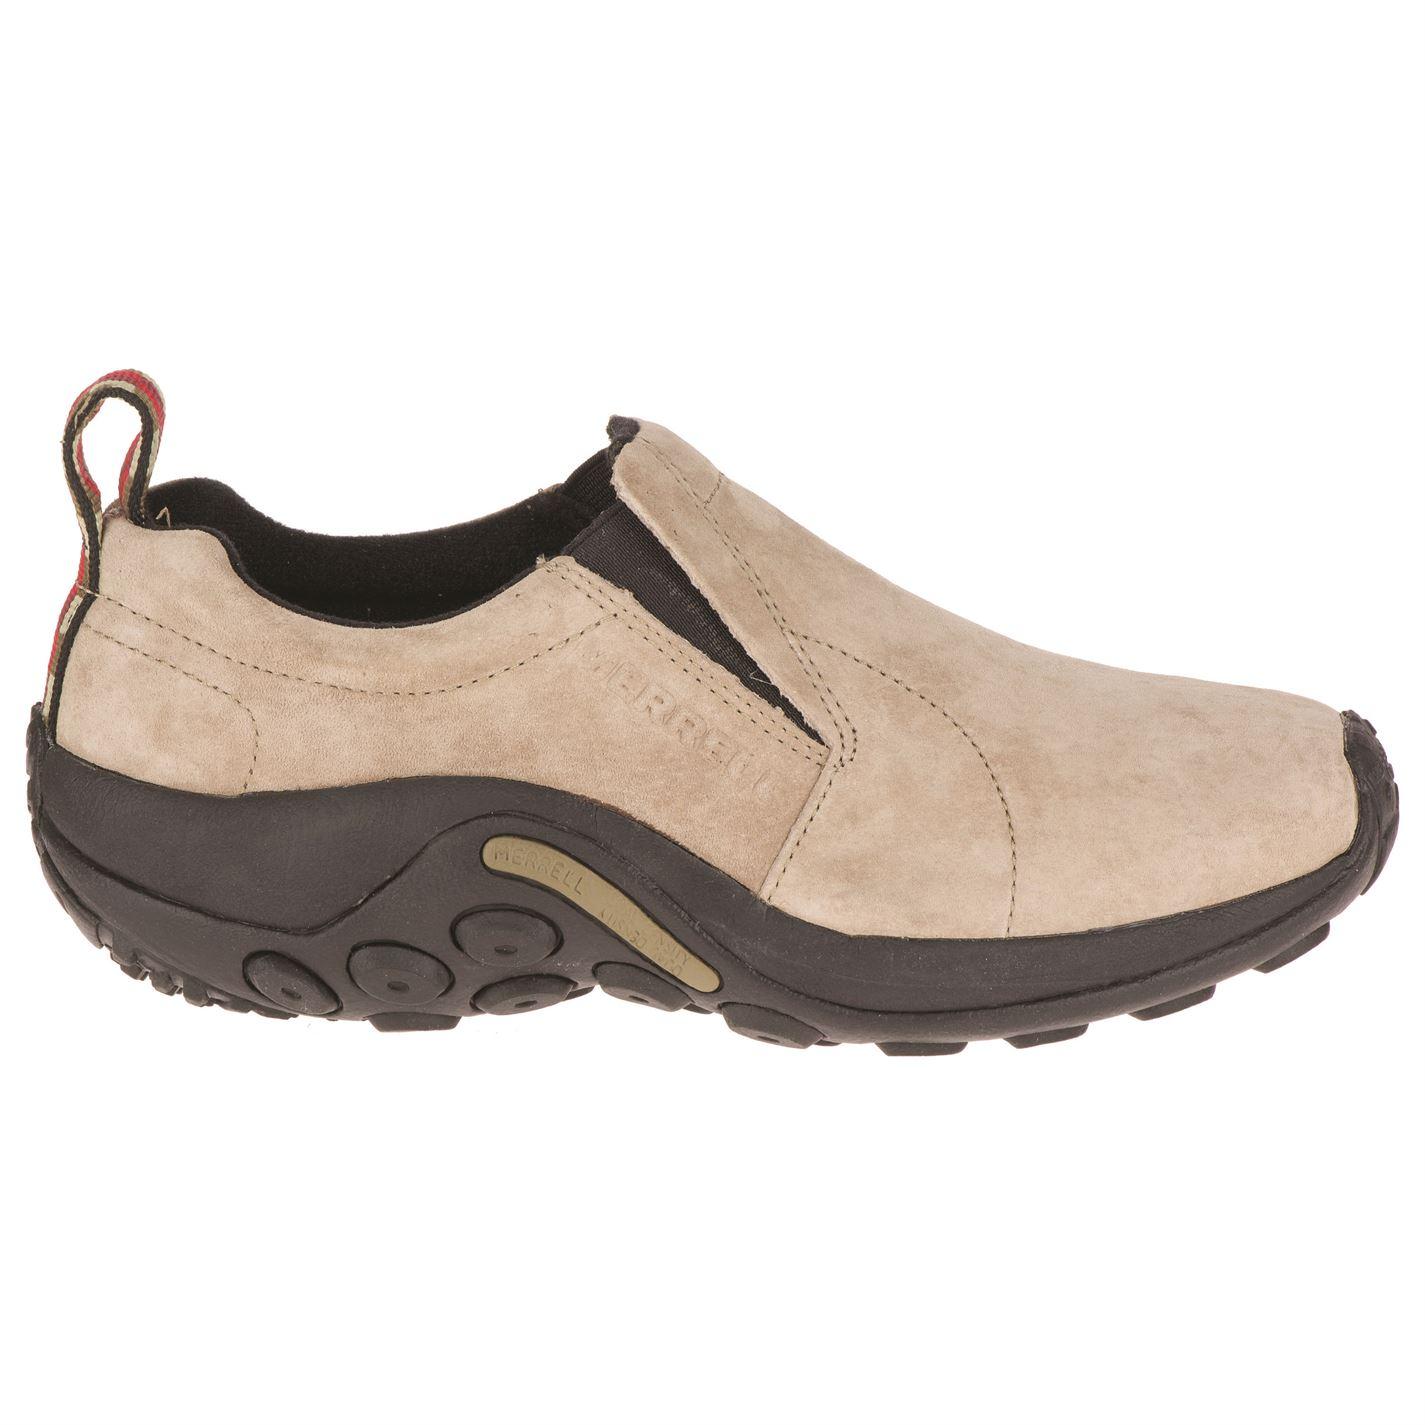 fb42cf1e9ac Merrell Jungle Moc Ladies Walking Shoes